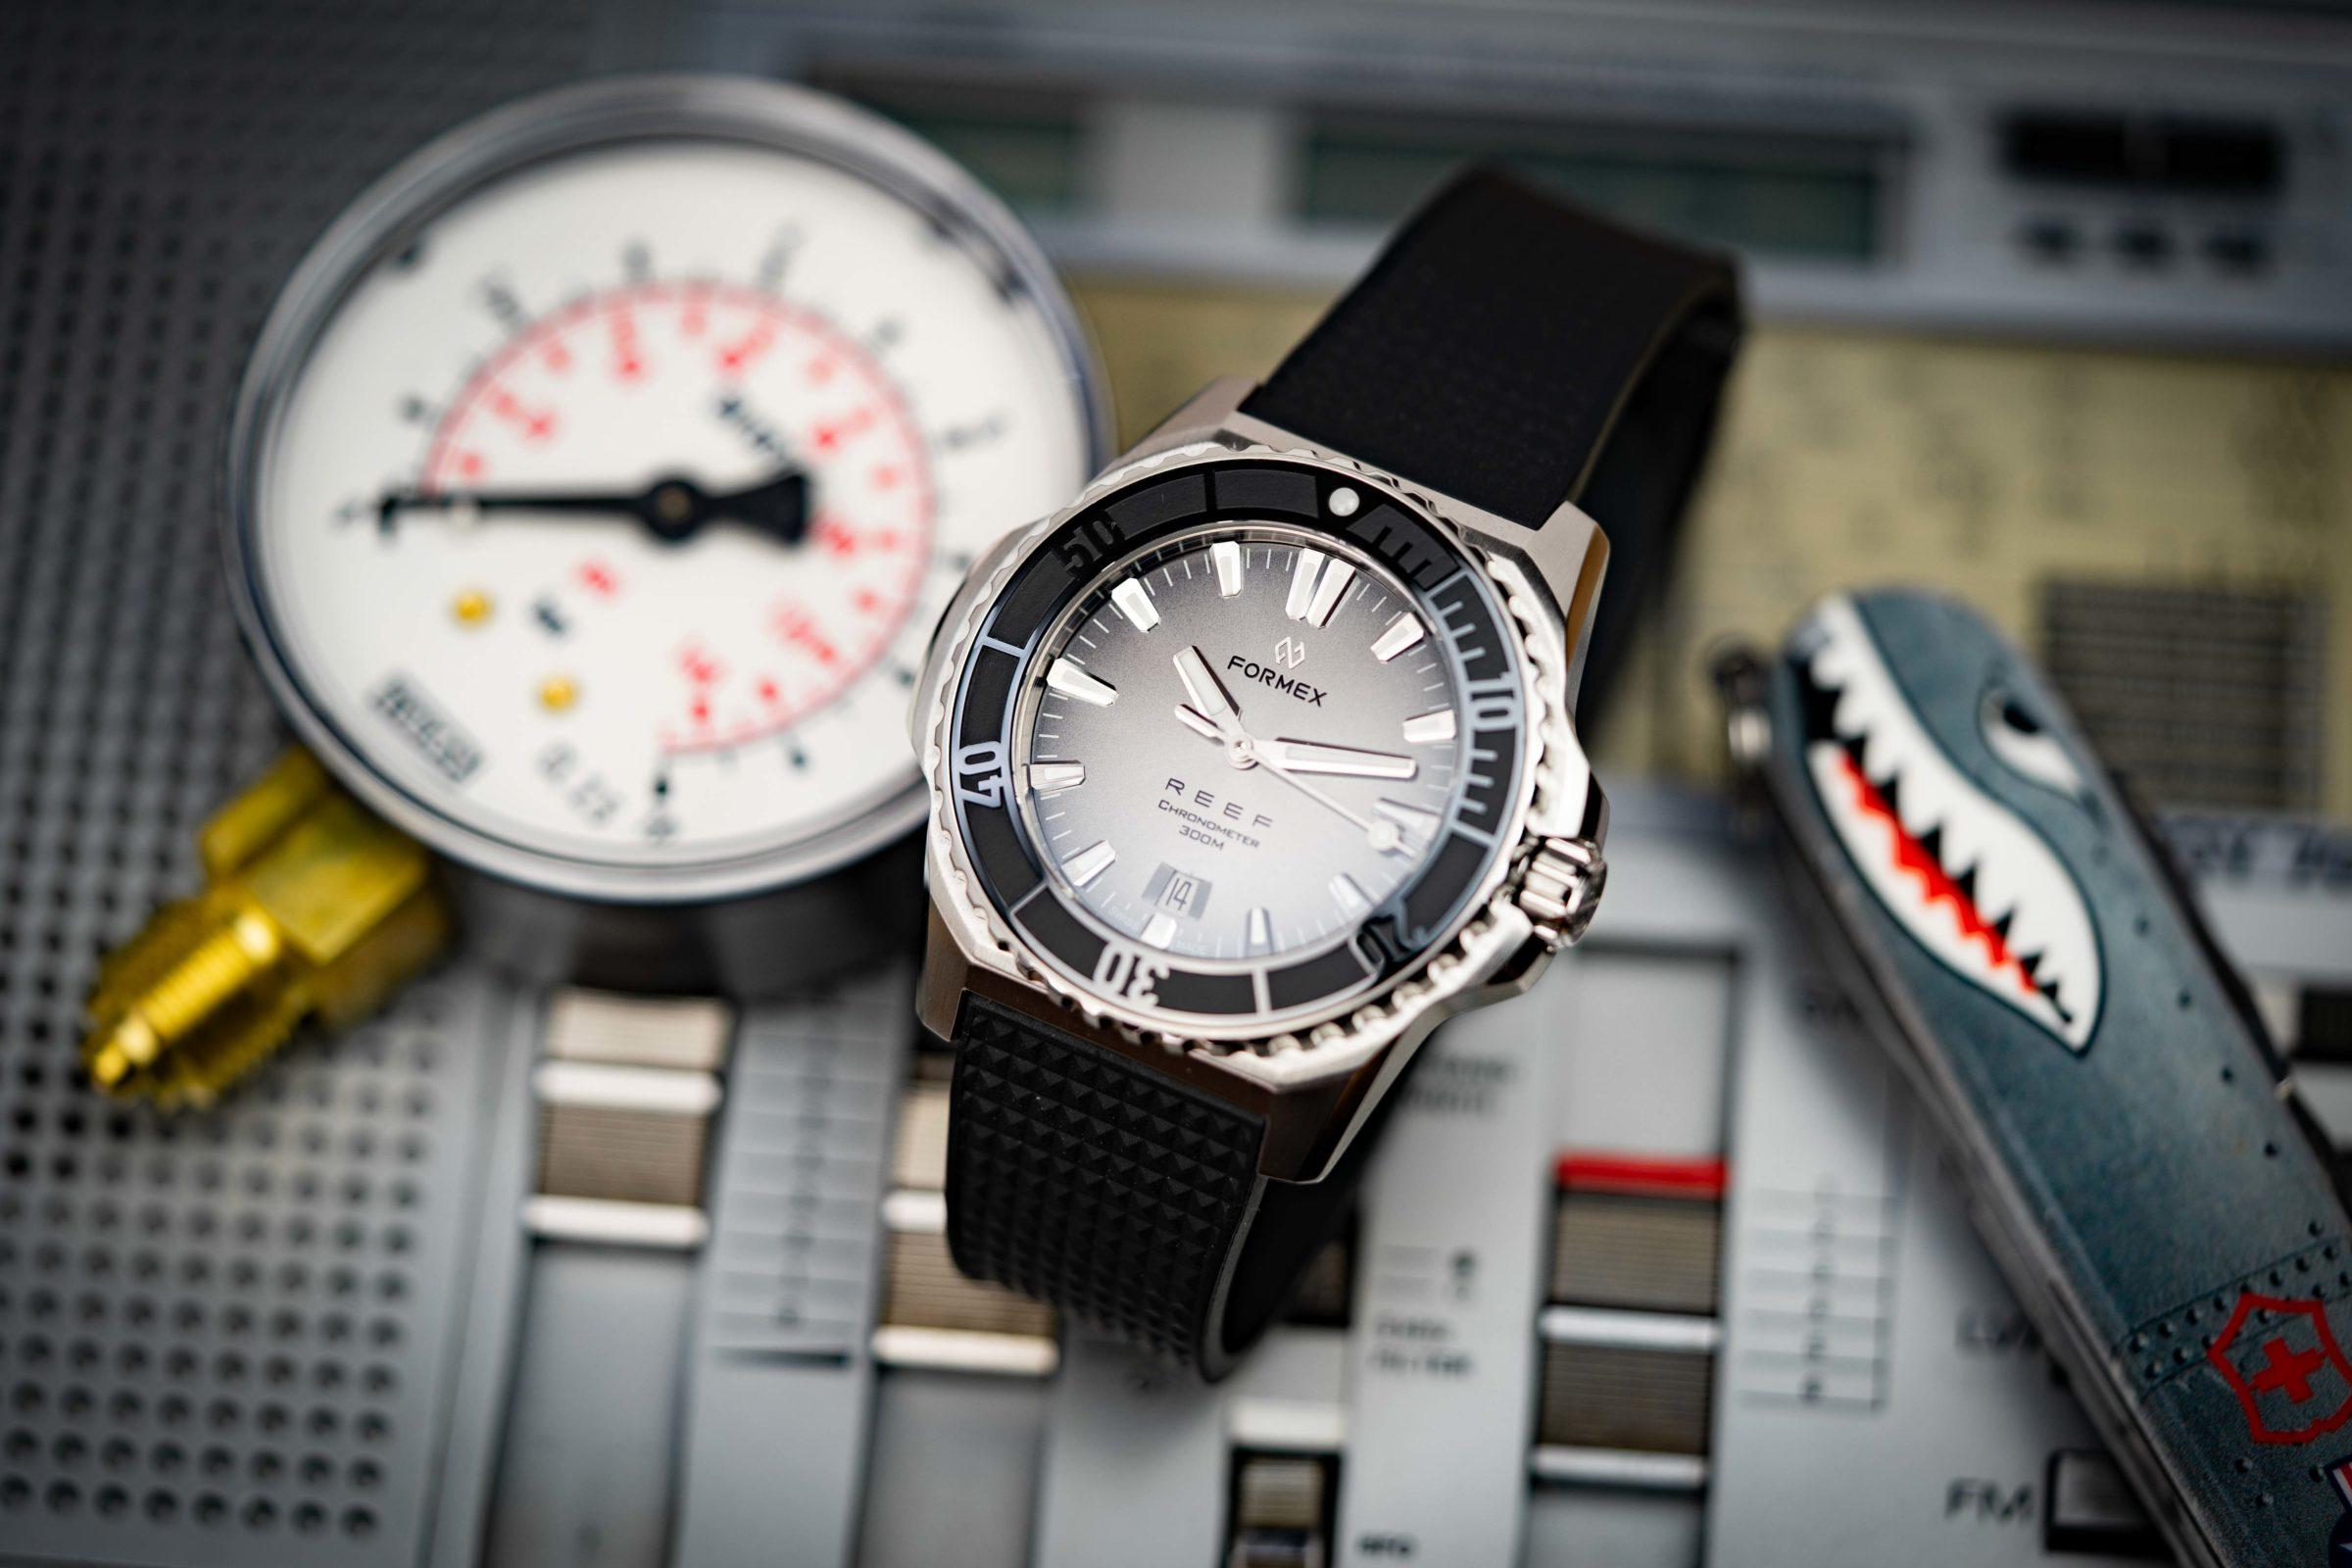 Formex-Reef-Automatik-Chronometer-300m-10